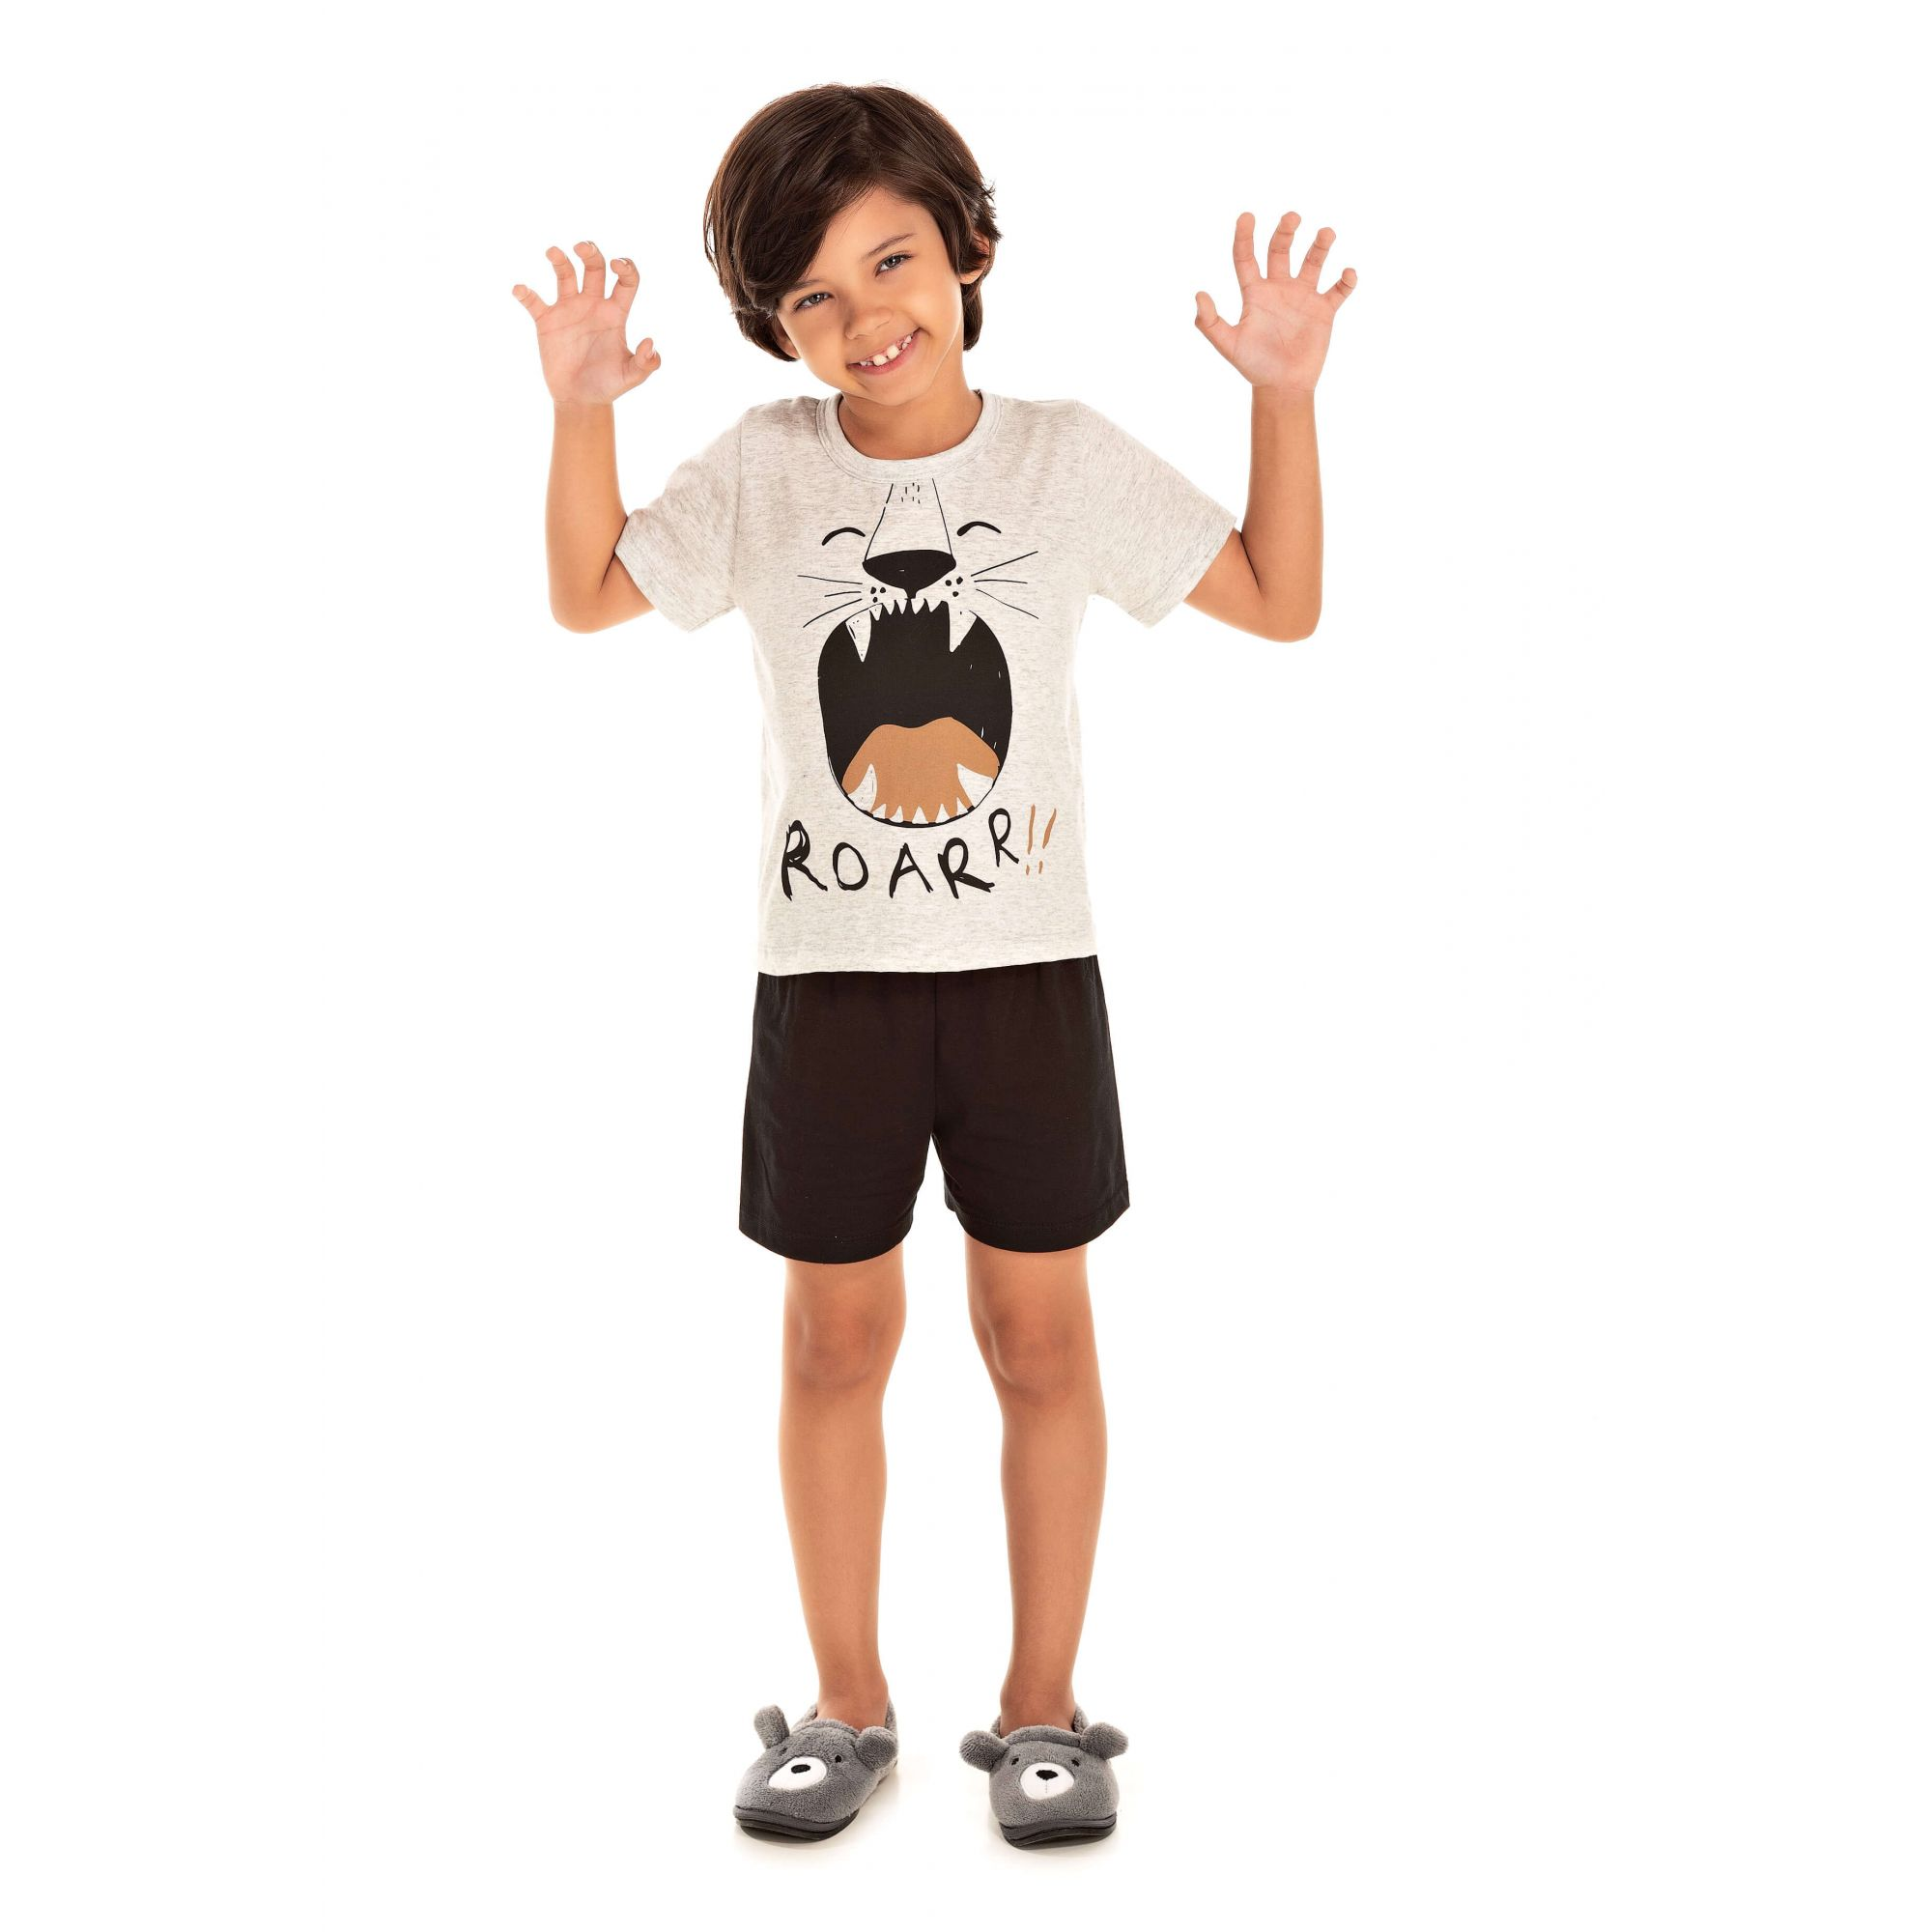 006 - Pijama Infantil Masculino Tigre - Pérola